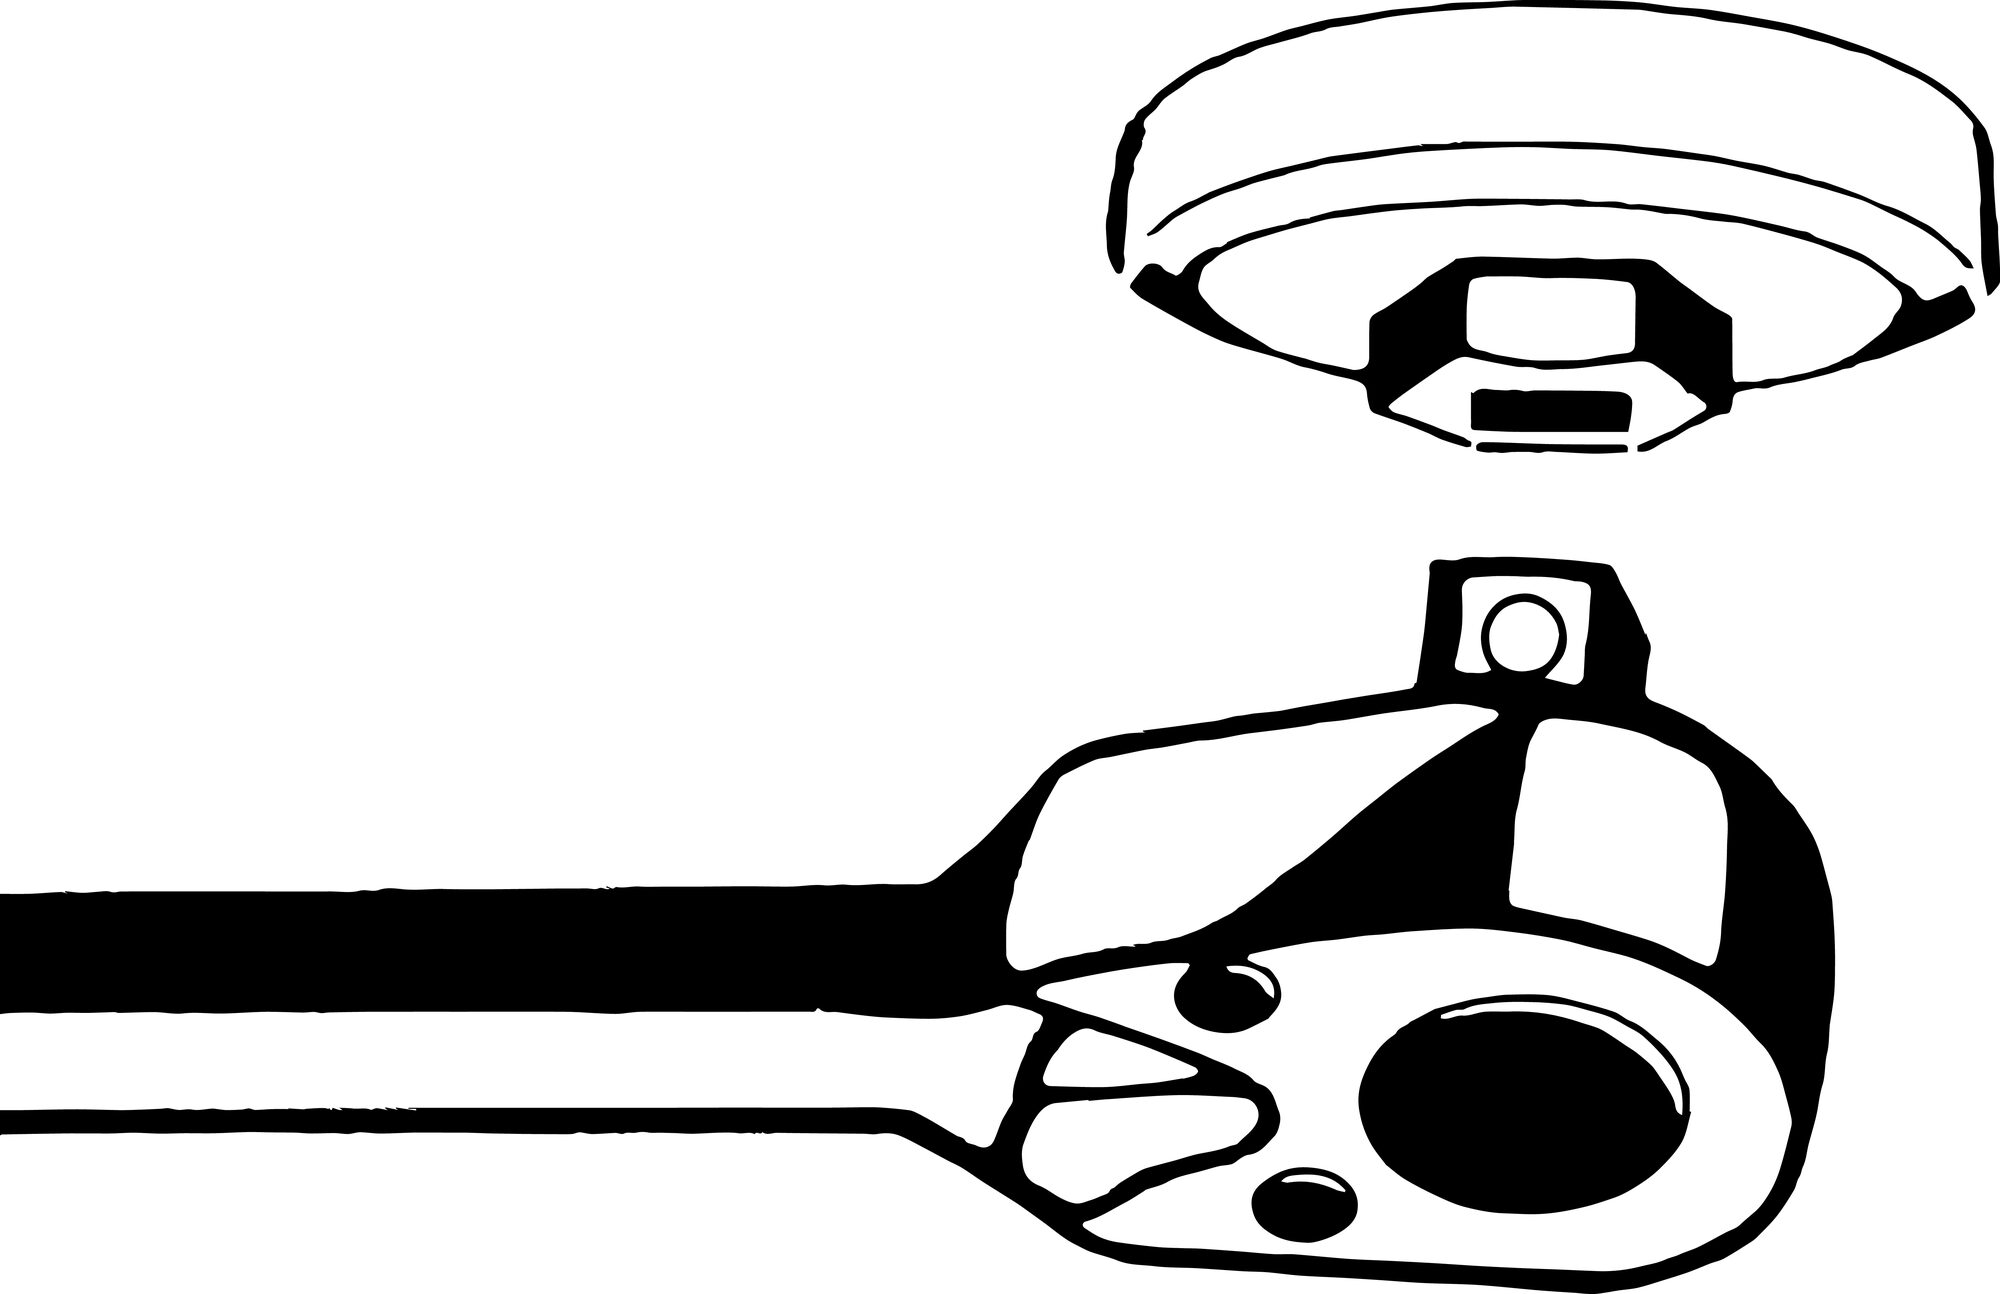 HAZET Ölfilter-Schlüssel 2169-66 ∙ Vierkant hohl 12,5 mm (1/2 Zoll) ∙ Rillenprofil ∙ 76 mm